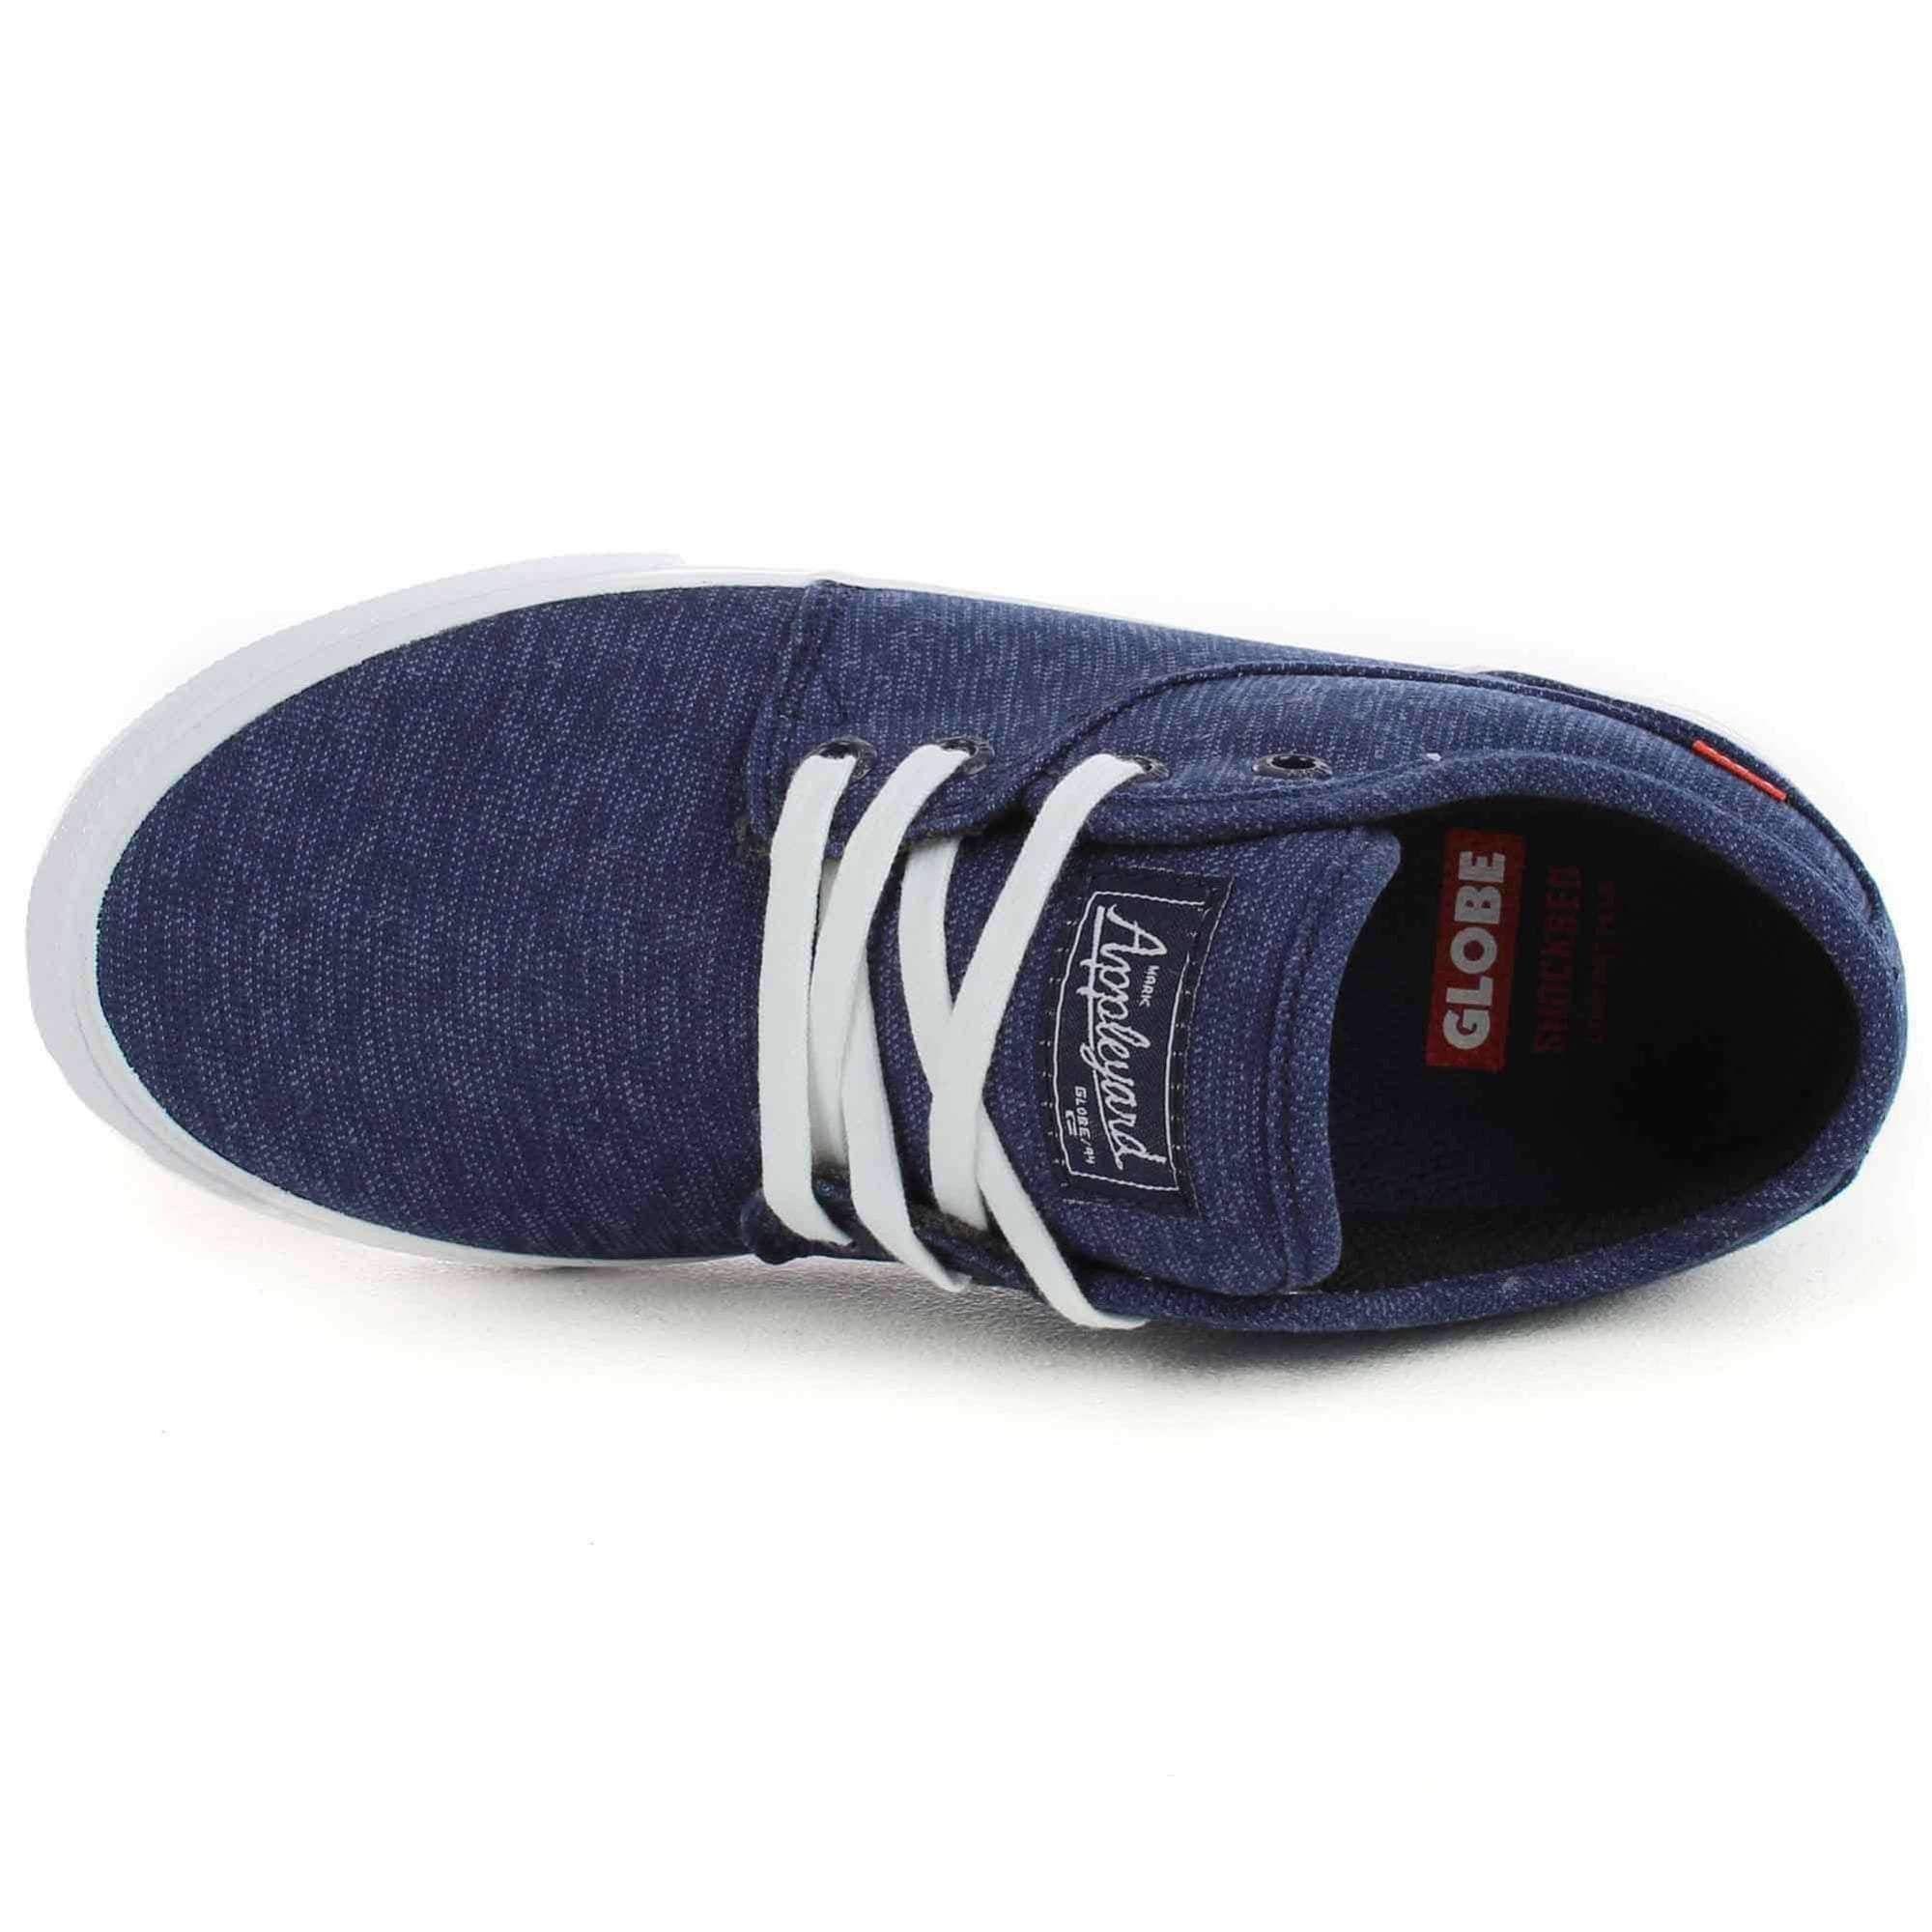 Globe Mahalo Kids Shoes In Moonlight Blue Boys Skate Shoes Kid